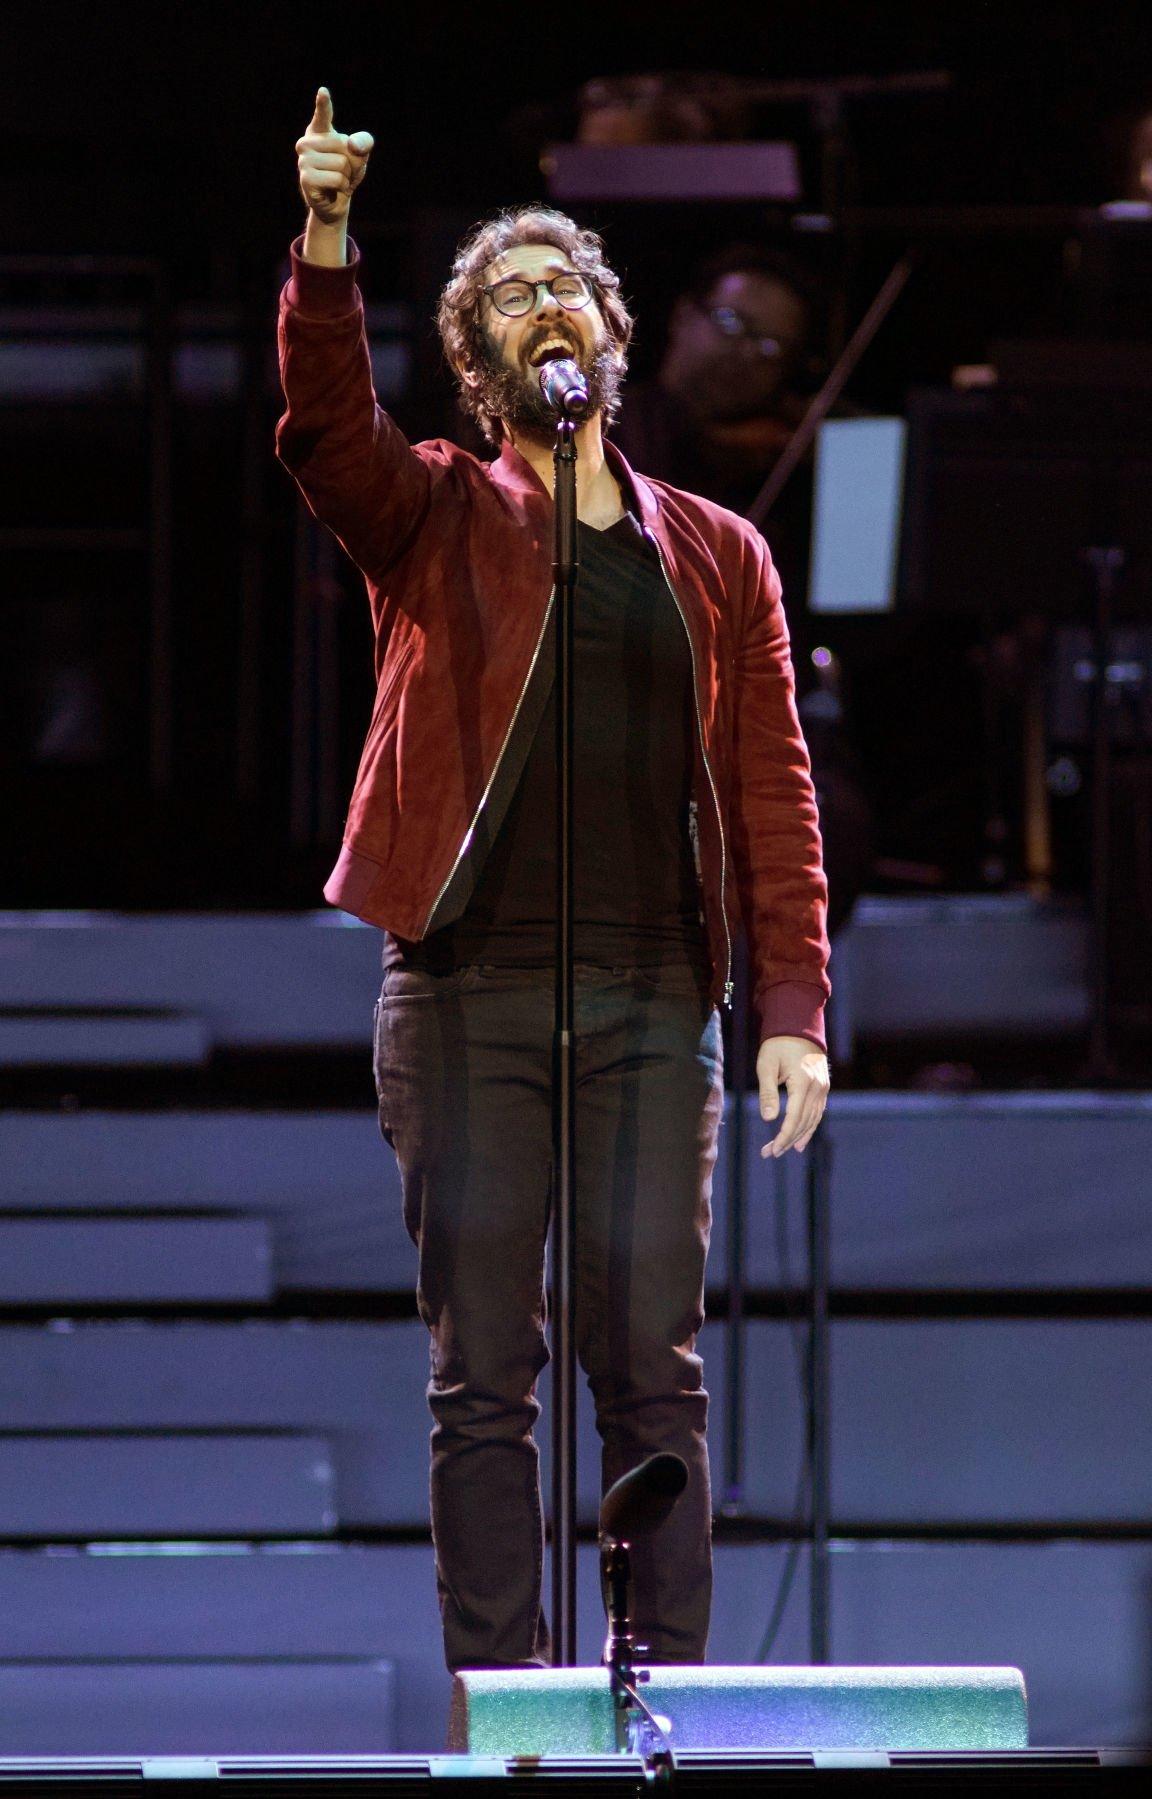 Josh Groban in Concert - Chicago